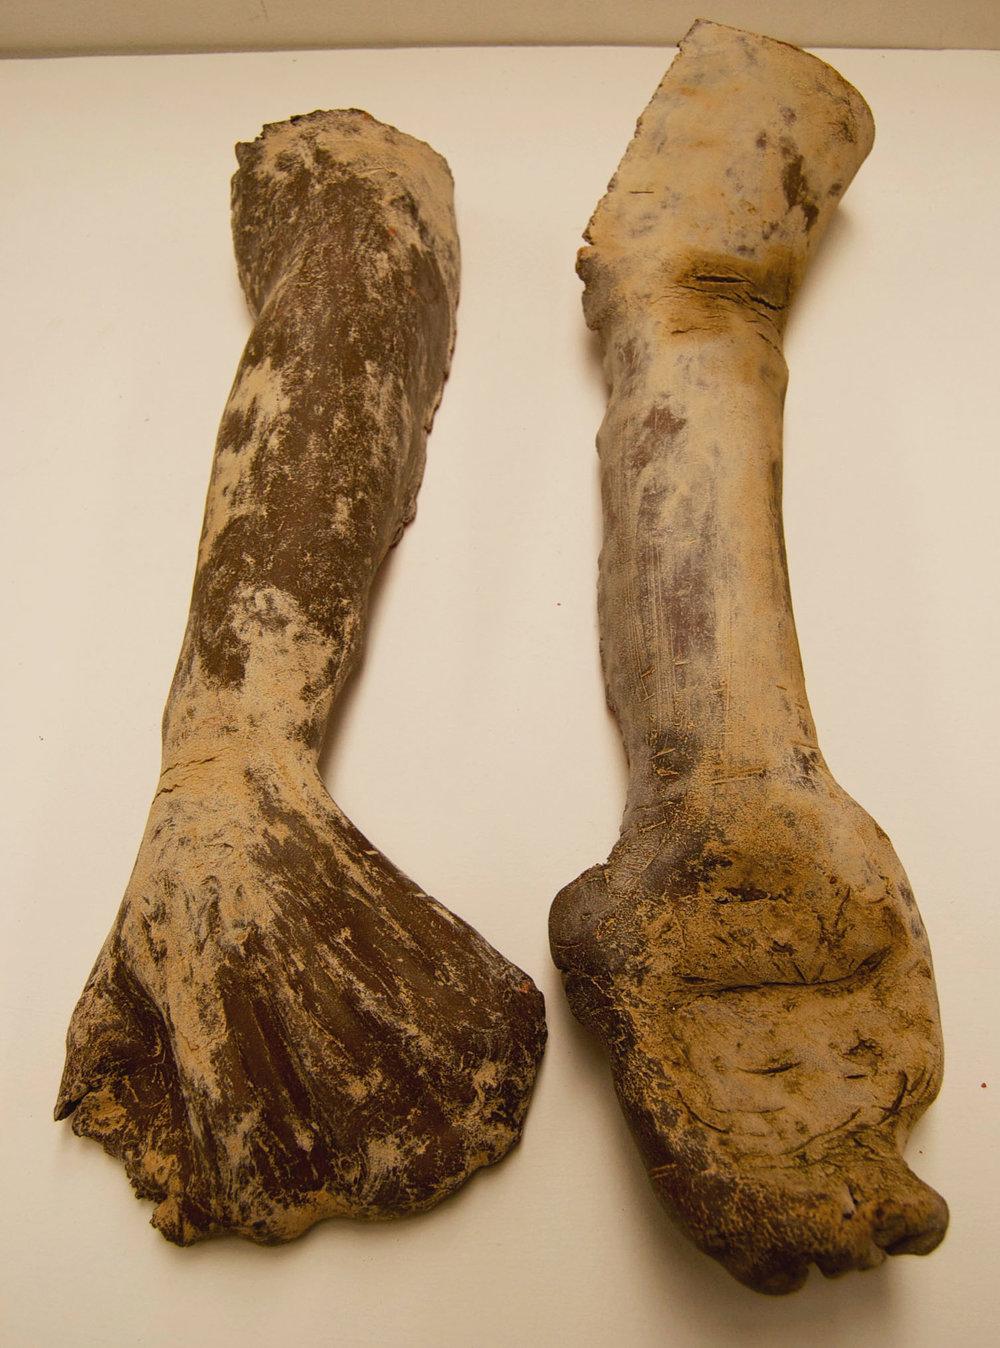 clay sculpture hand arm uconn.jpg